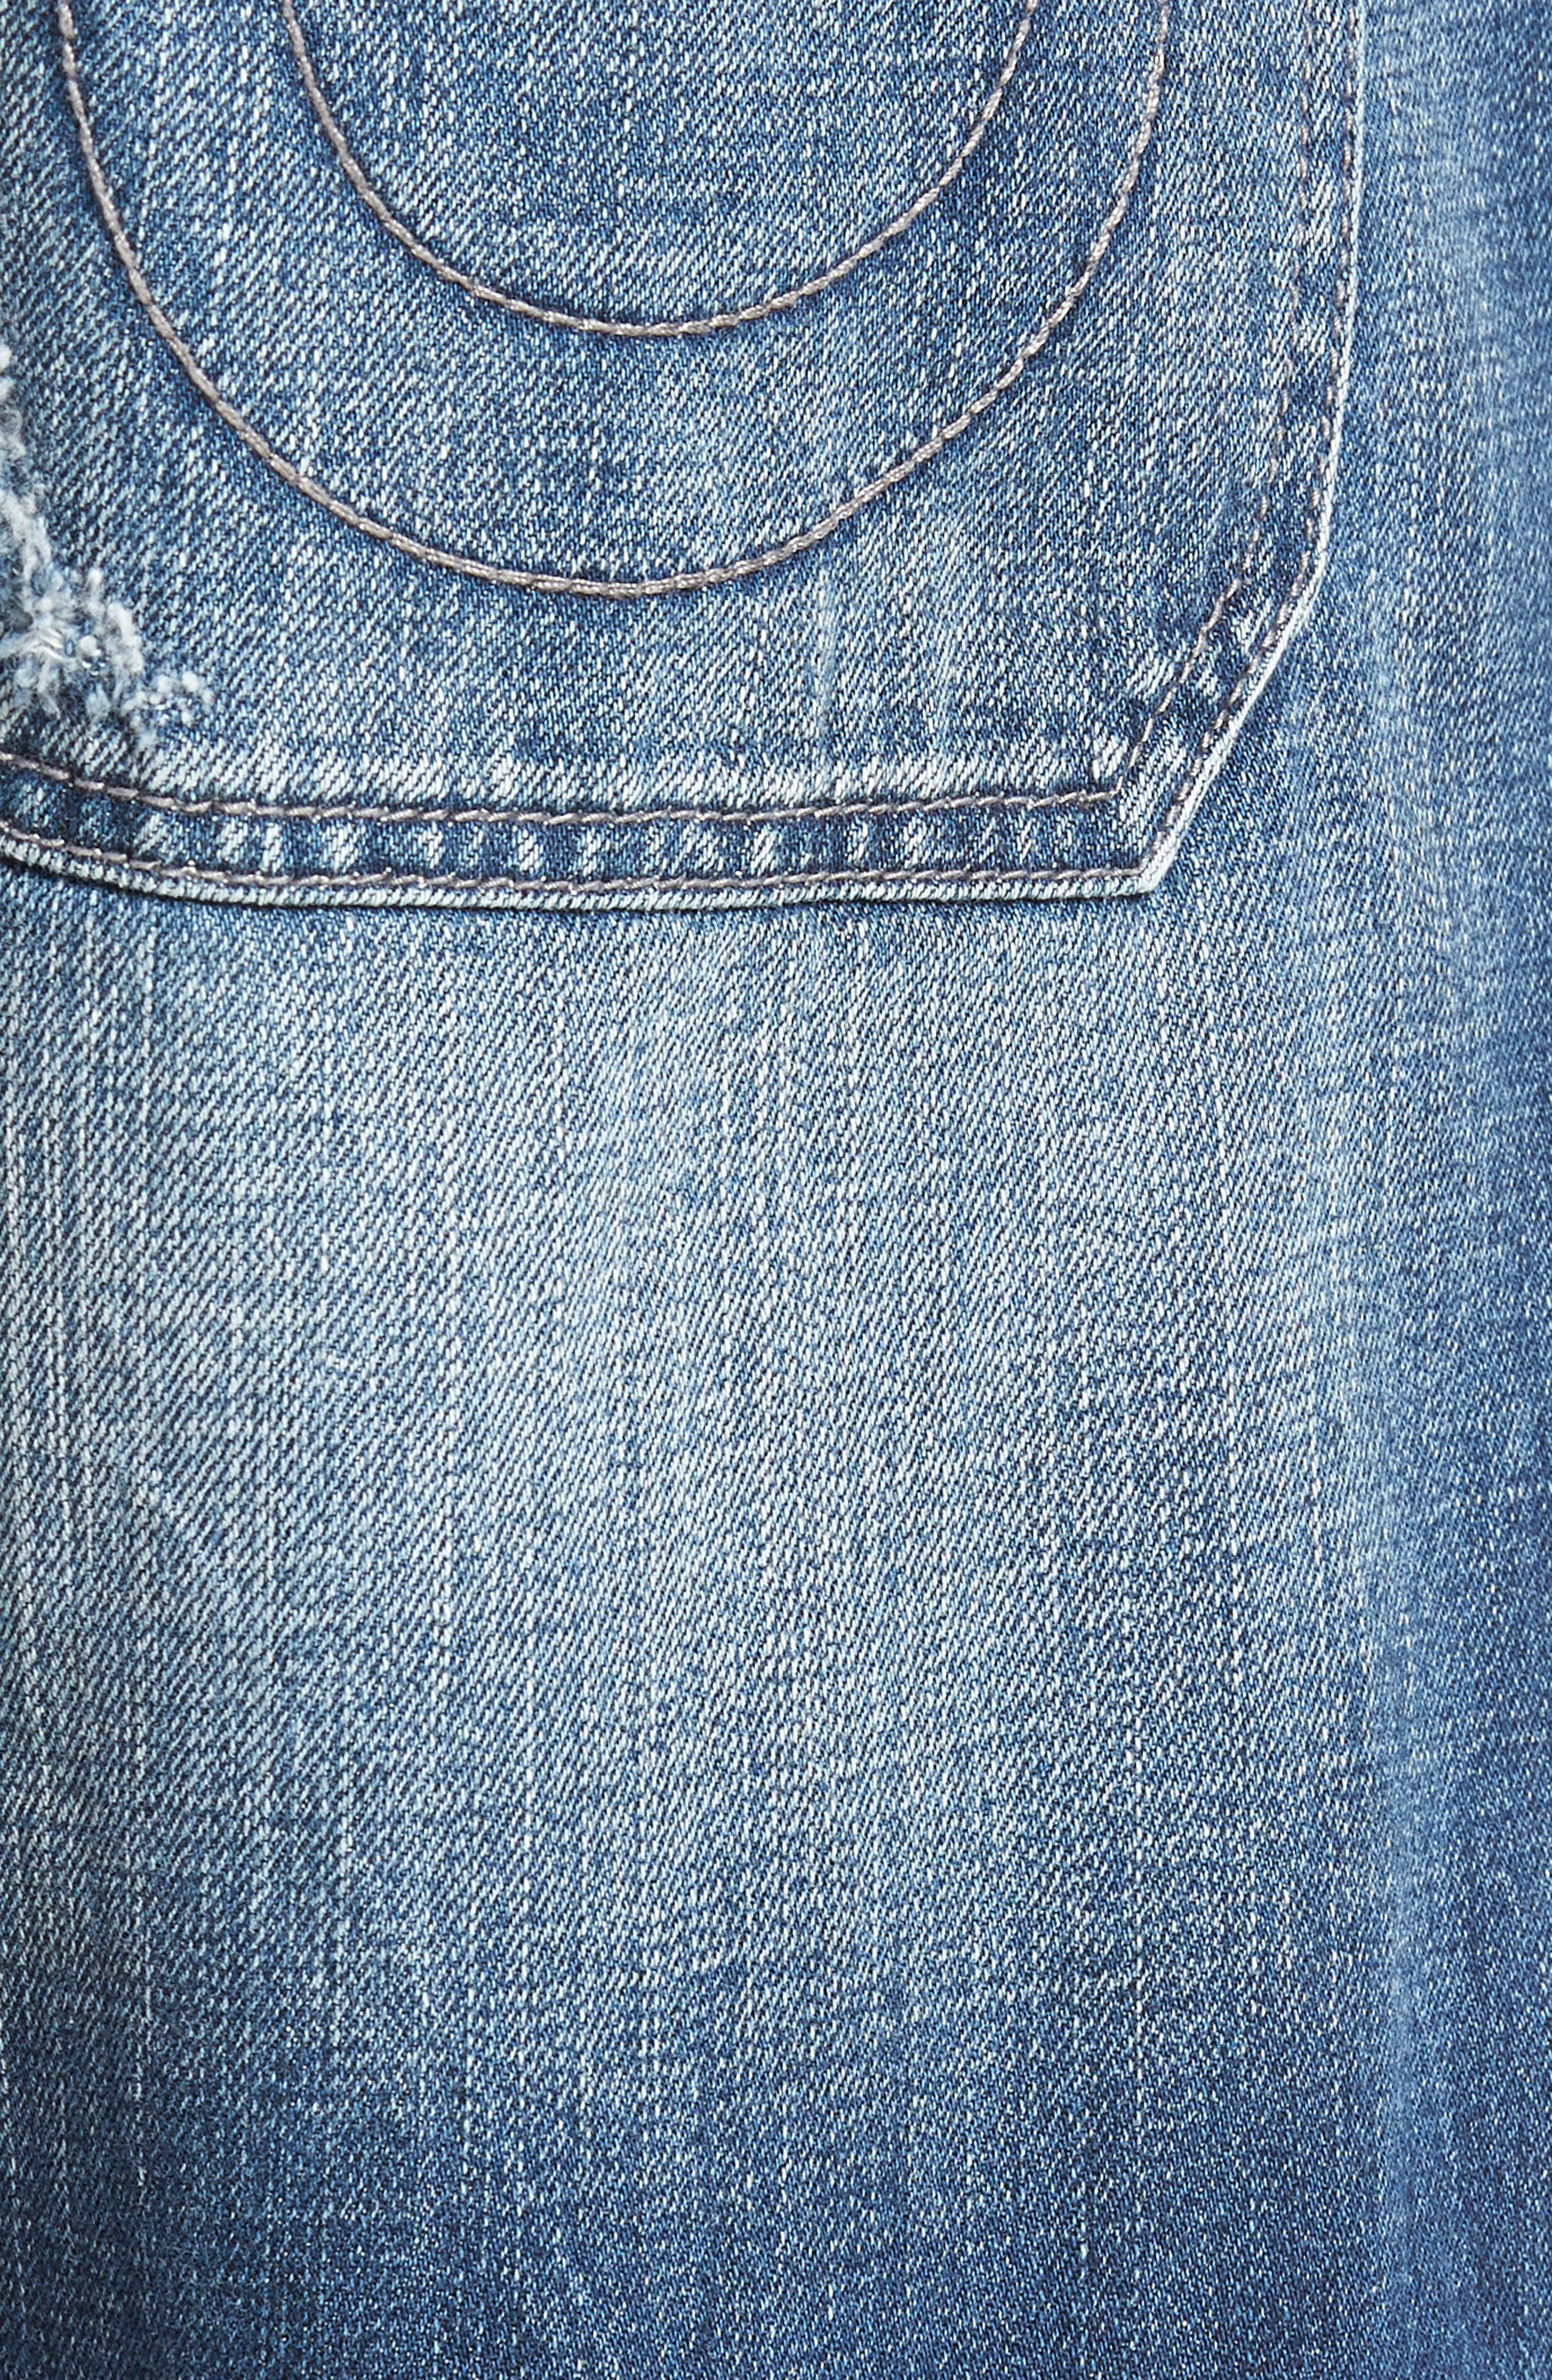 Field Shorts,                             Alternate thumbnail 5, color,                             Worn Glen